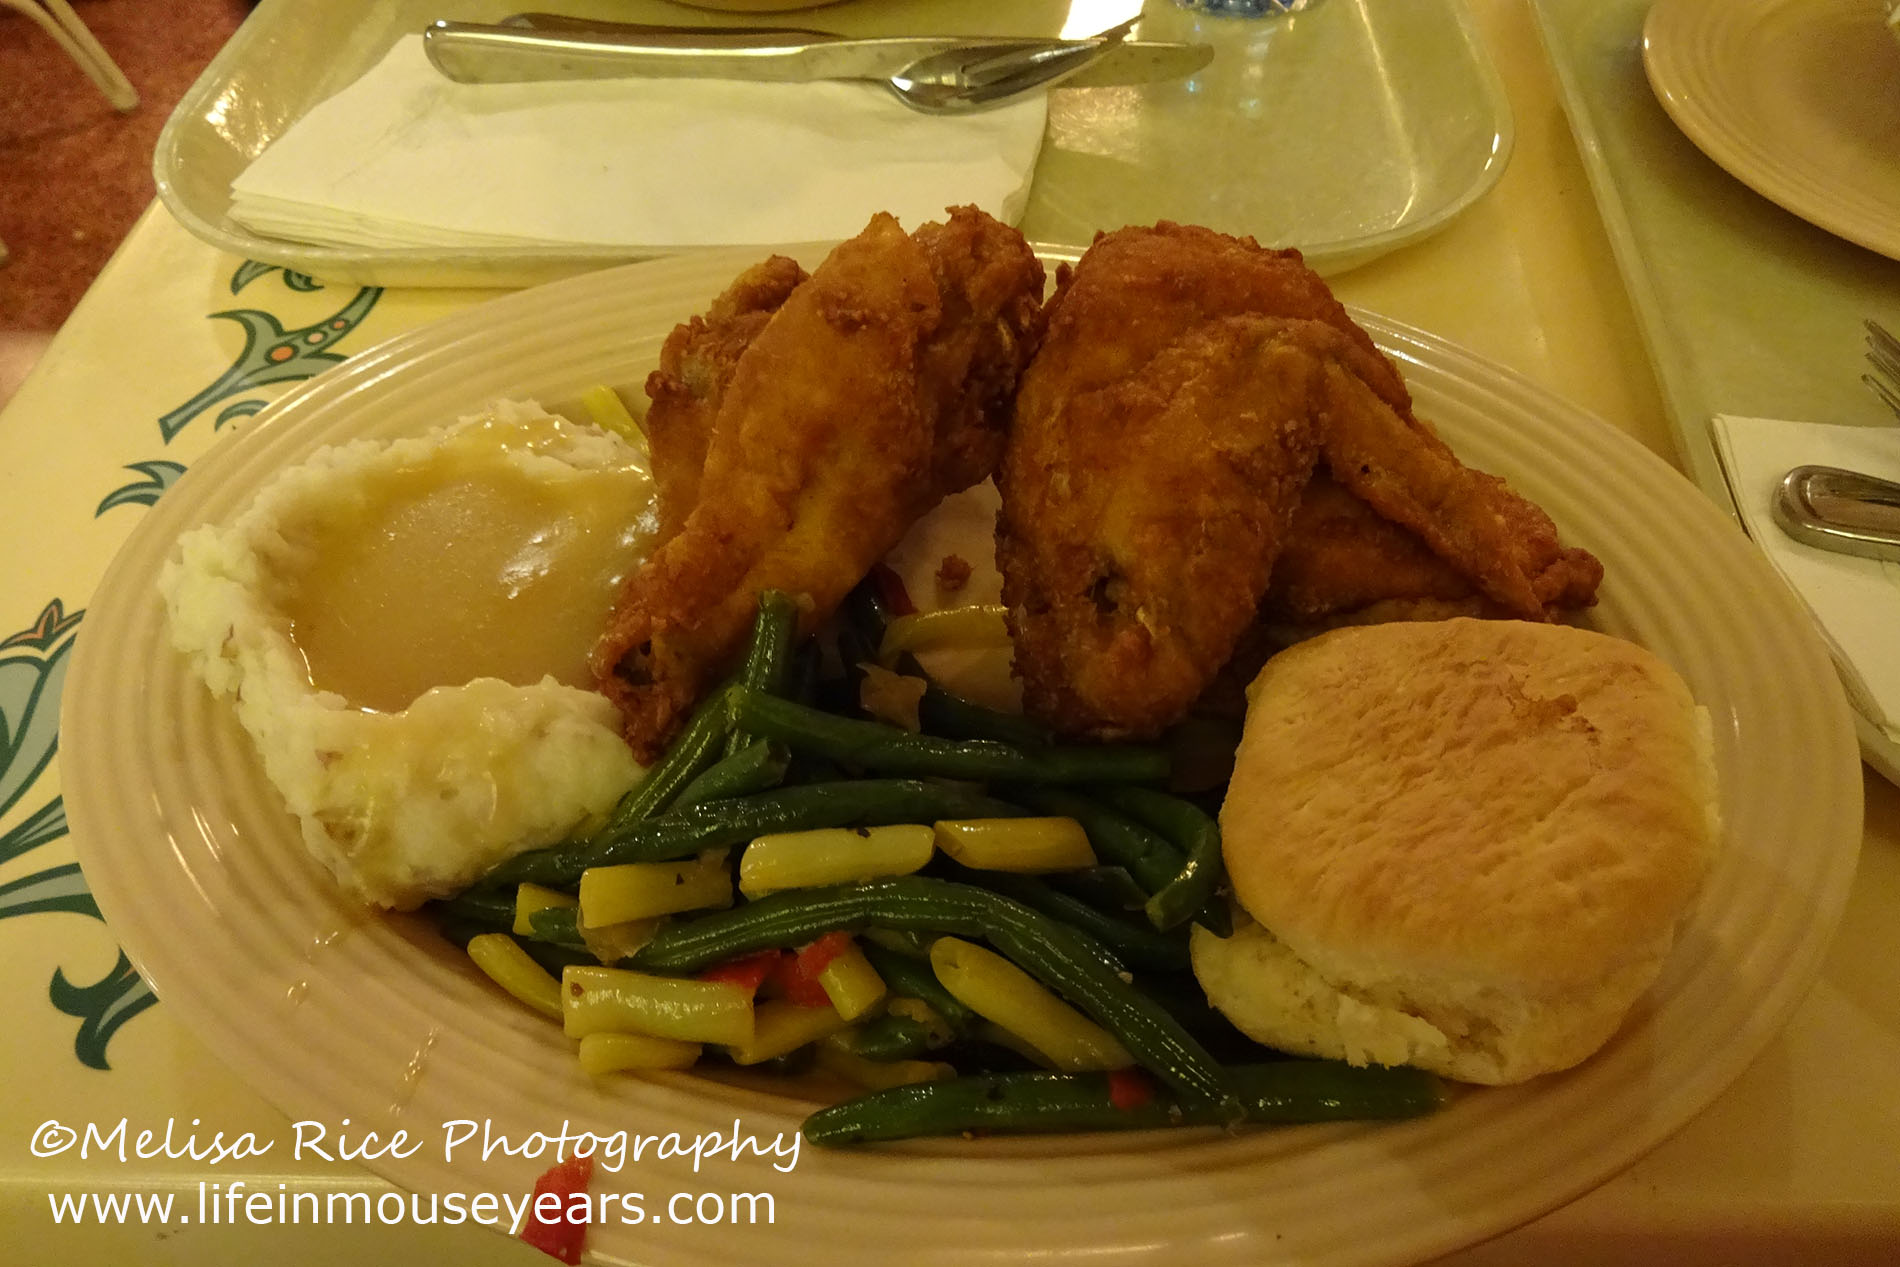 Dining Tips at Plaza Inn in Disneyland www.lifeinmouseyears.com #lifeinmouseyears #plazainn #disneyland #friedchicken